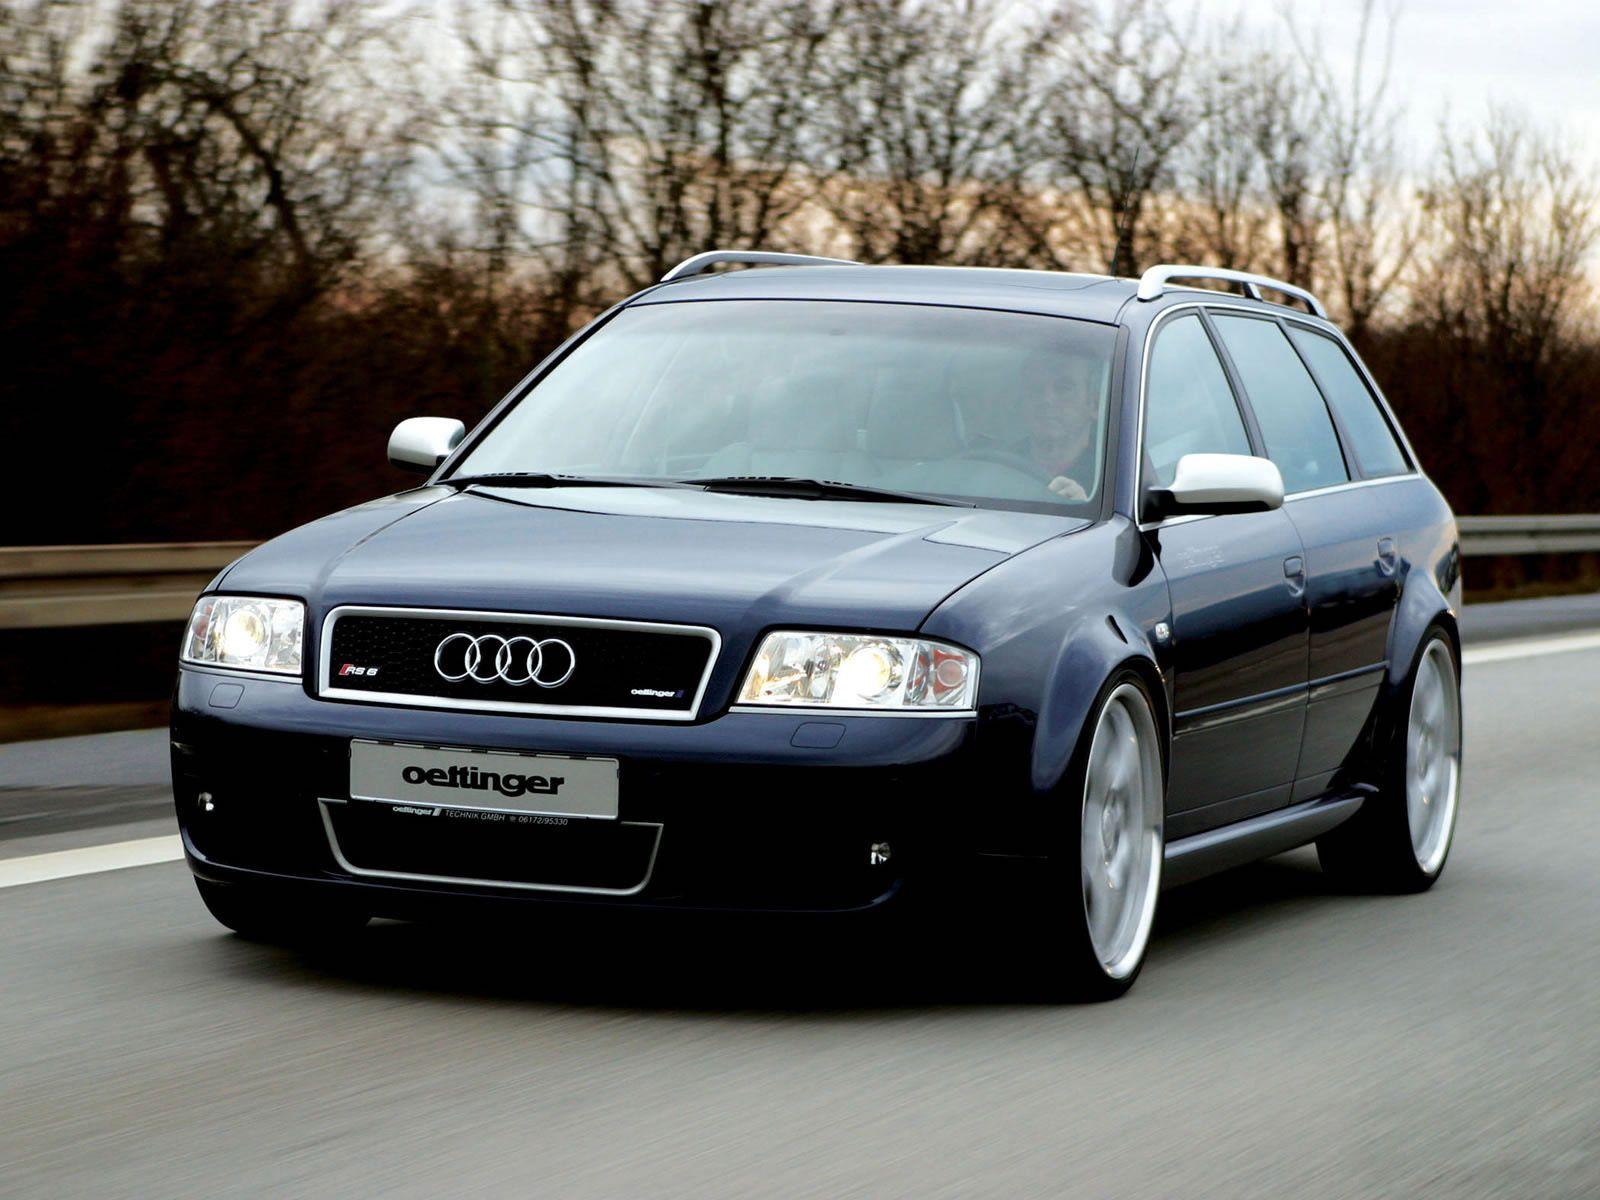 Audi Rs6 C5 Avant Photos News Reviews Specs Car Listings Audi Rs6 Audi Allroad Black Audi